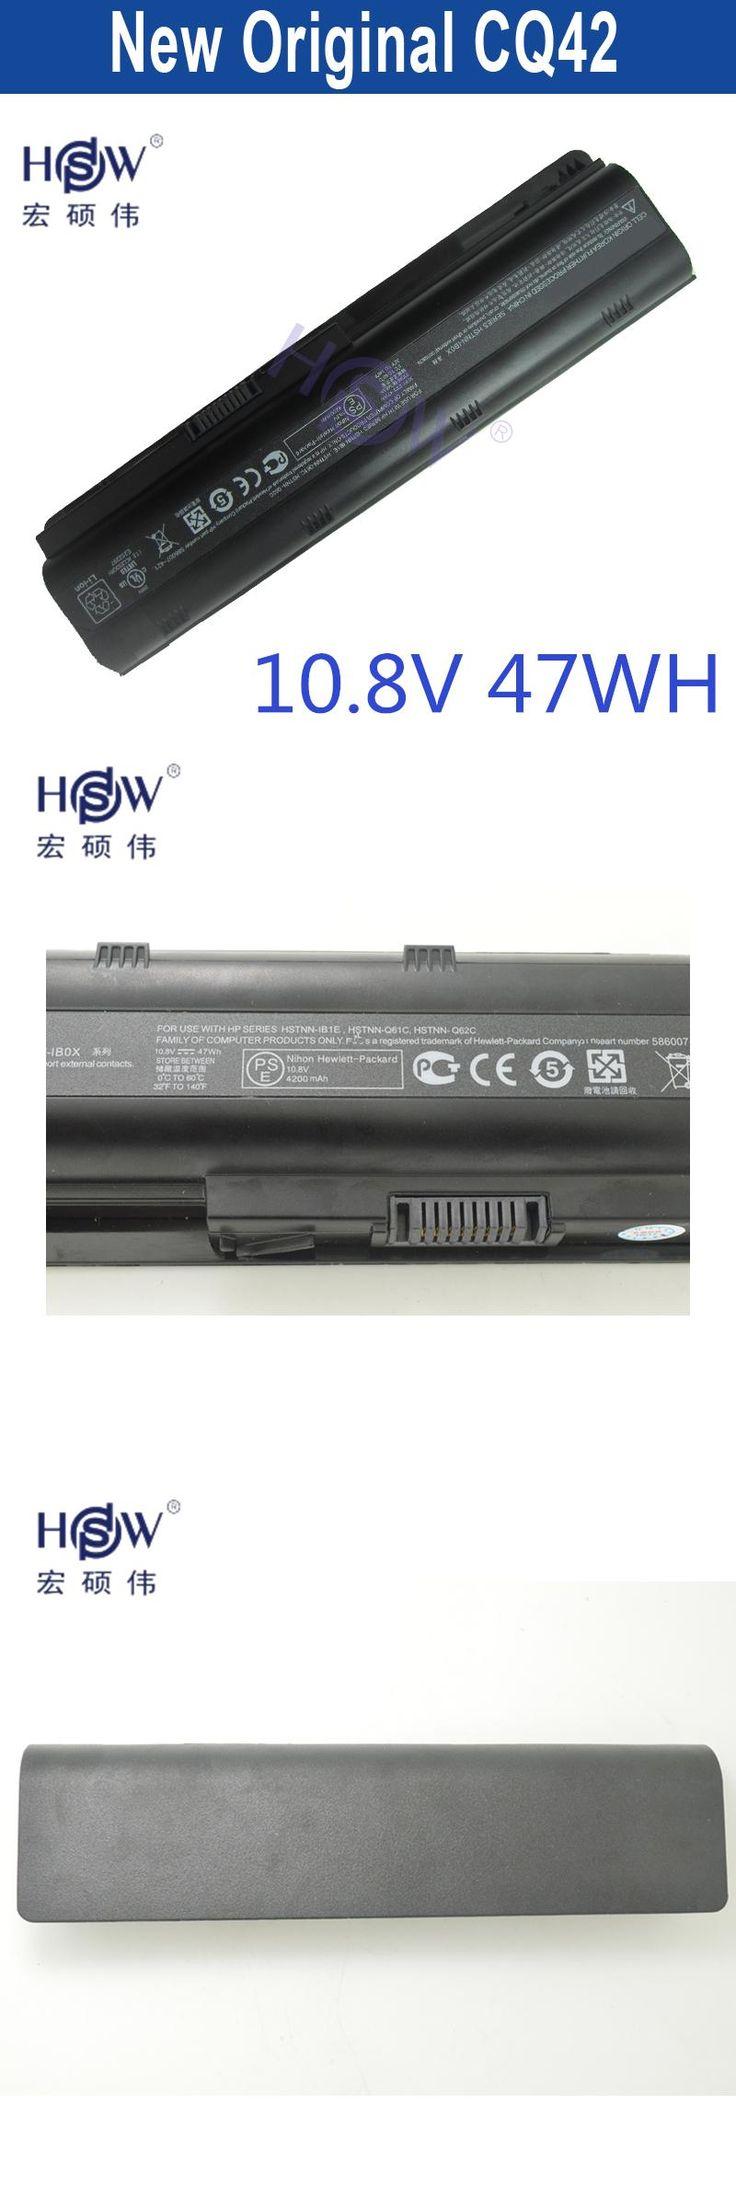 Genuine Battery for HP PAVILION DM4 DV3 DV5 DV6 DV7 G4 G6 G7 G72 G62 G42 for Compaq Presario CQ32 CQ42 CQ43 CQ56 CQ62 CQ72 MU06